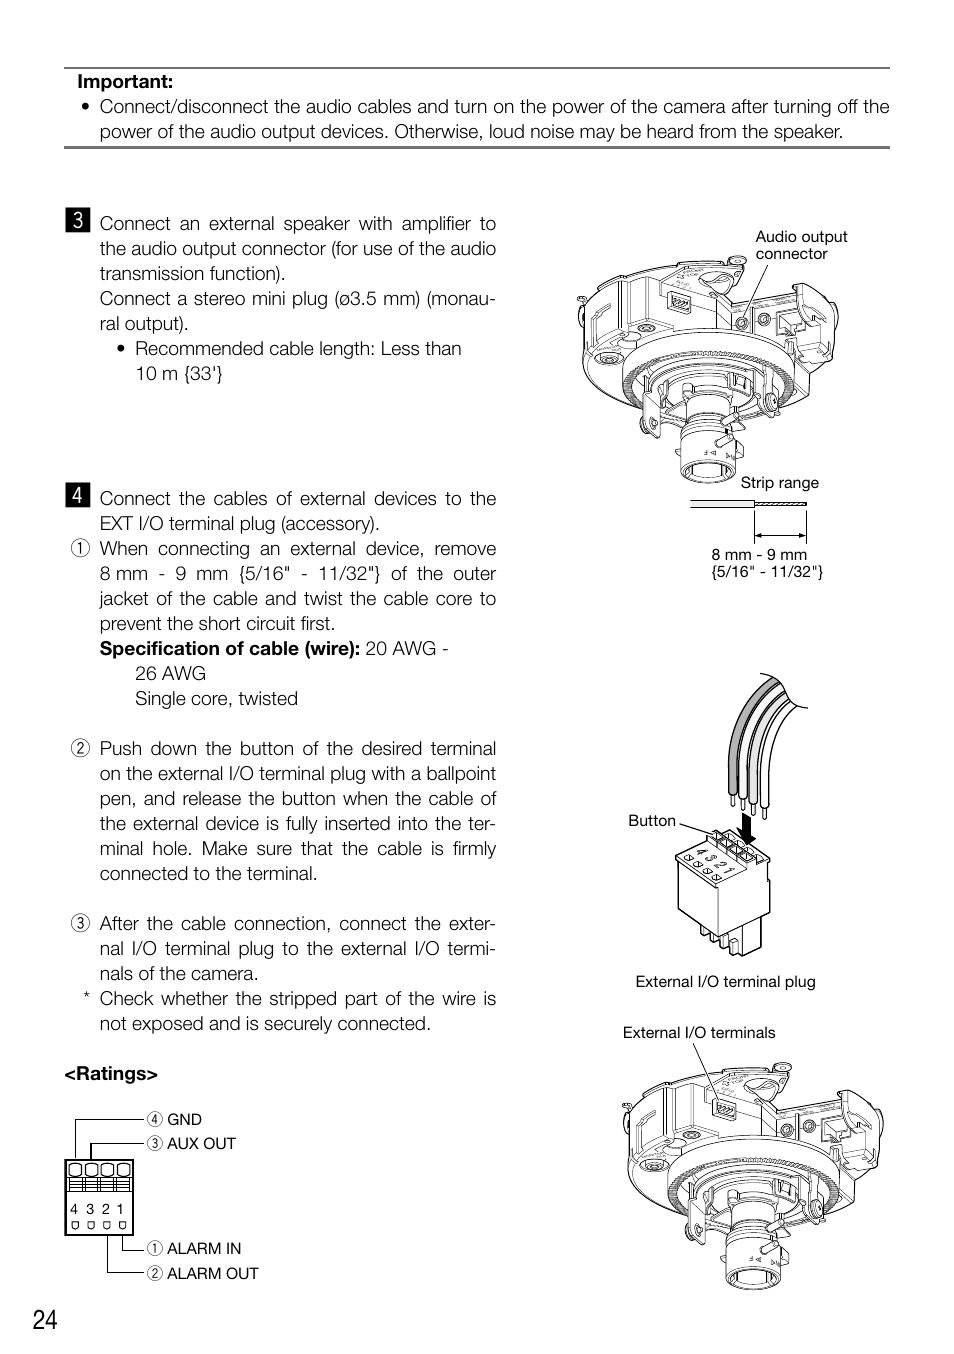 24 C Panasonic Wv Sf336 User Manual Page 44 Original Mode Amp Wiring Diagram